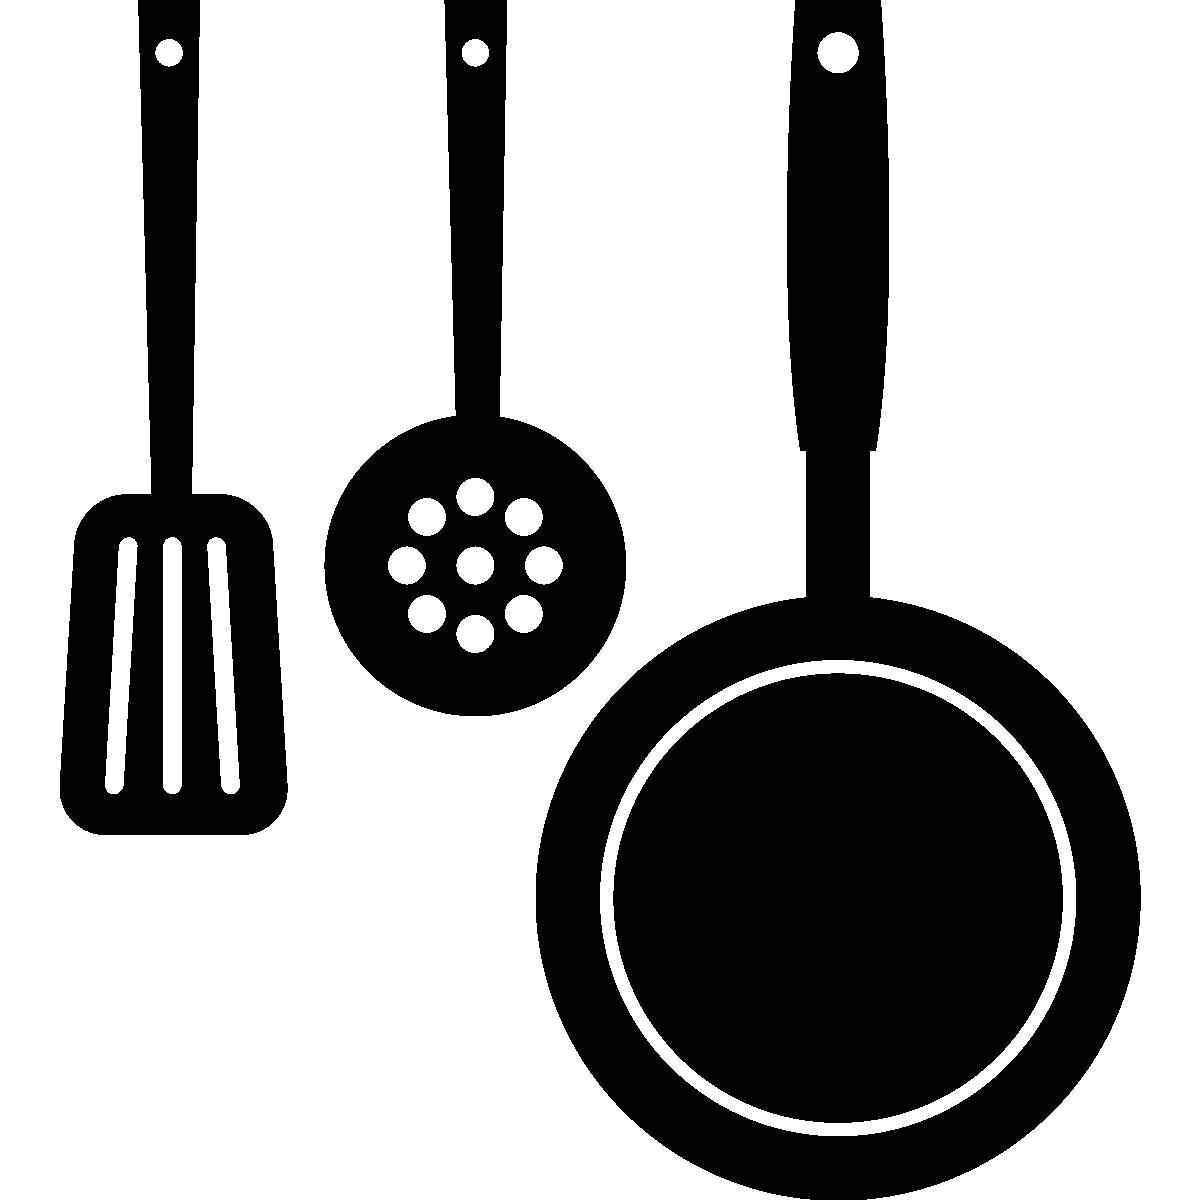 Stickers muraux pour la cuisine sticker casserole - Ustensiles de cuisine rigolo ...